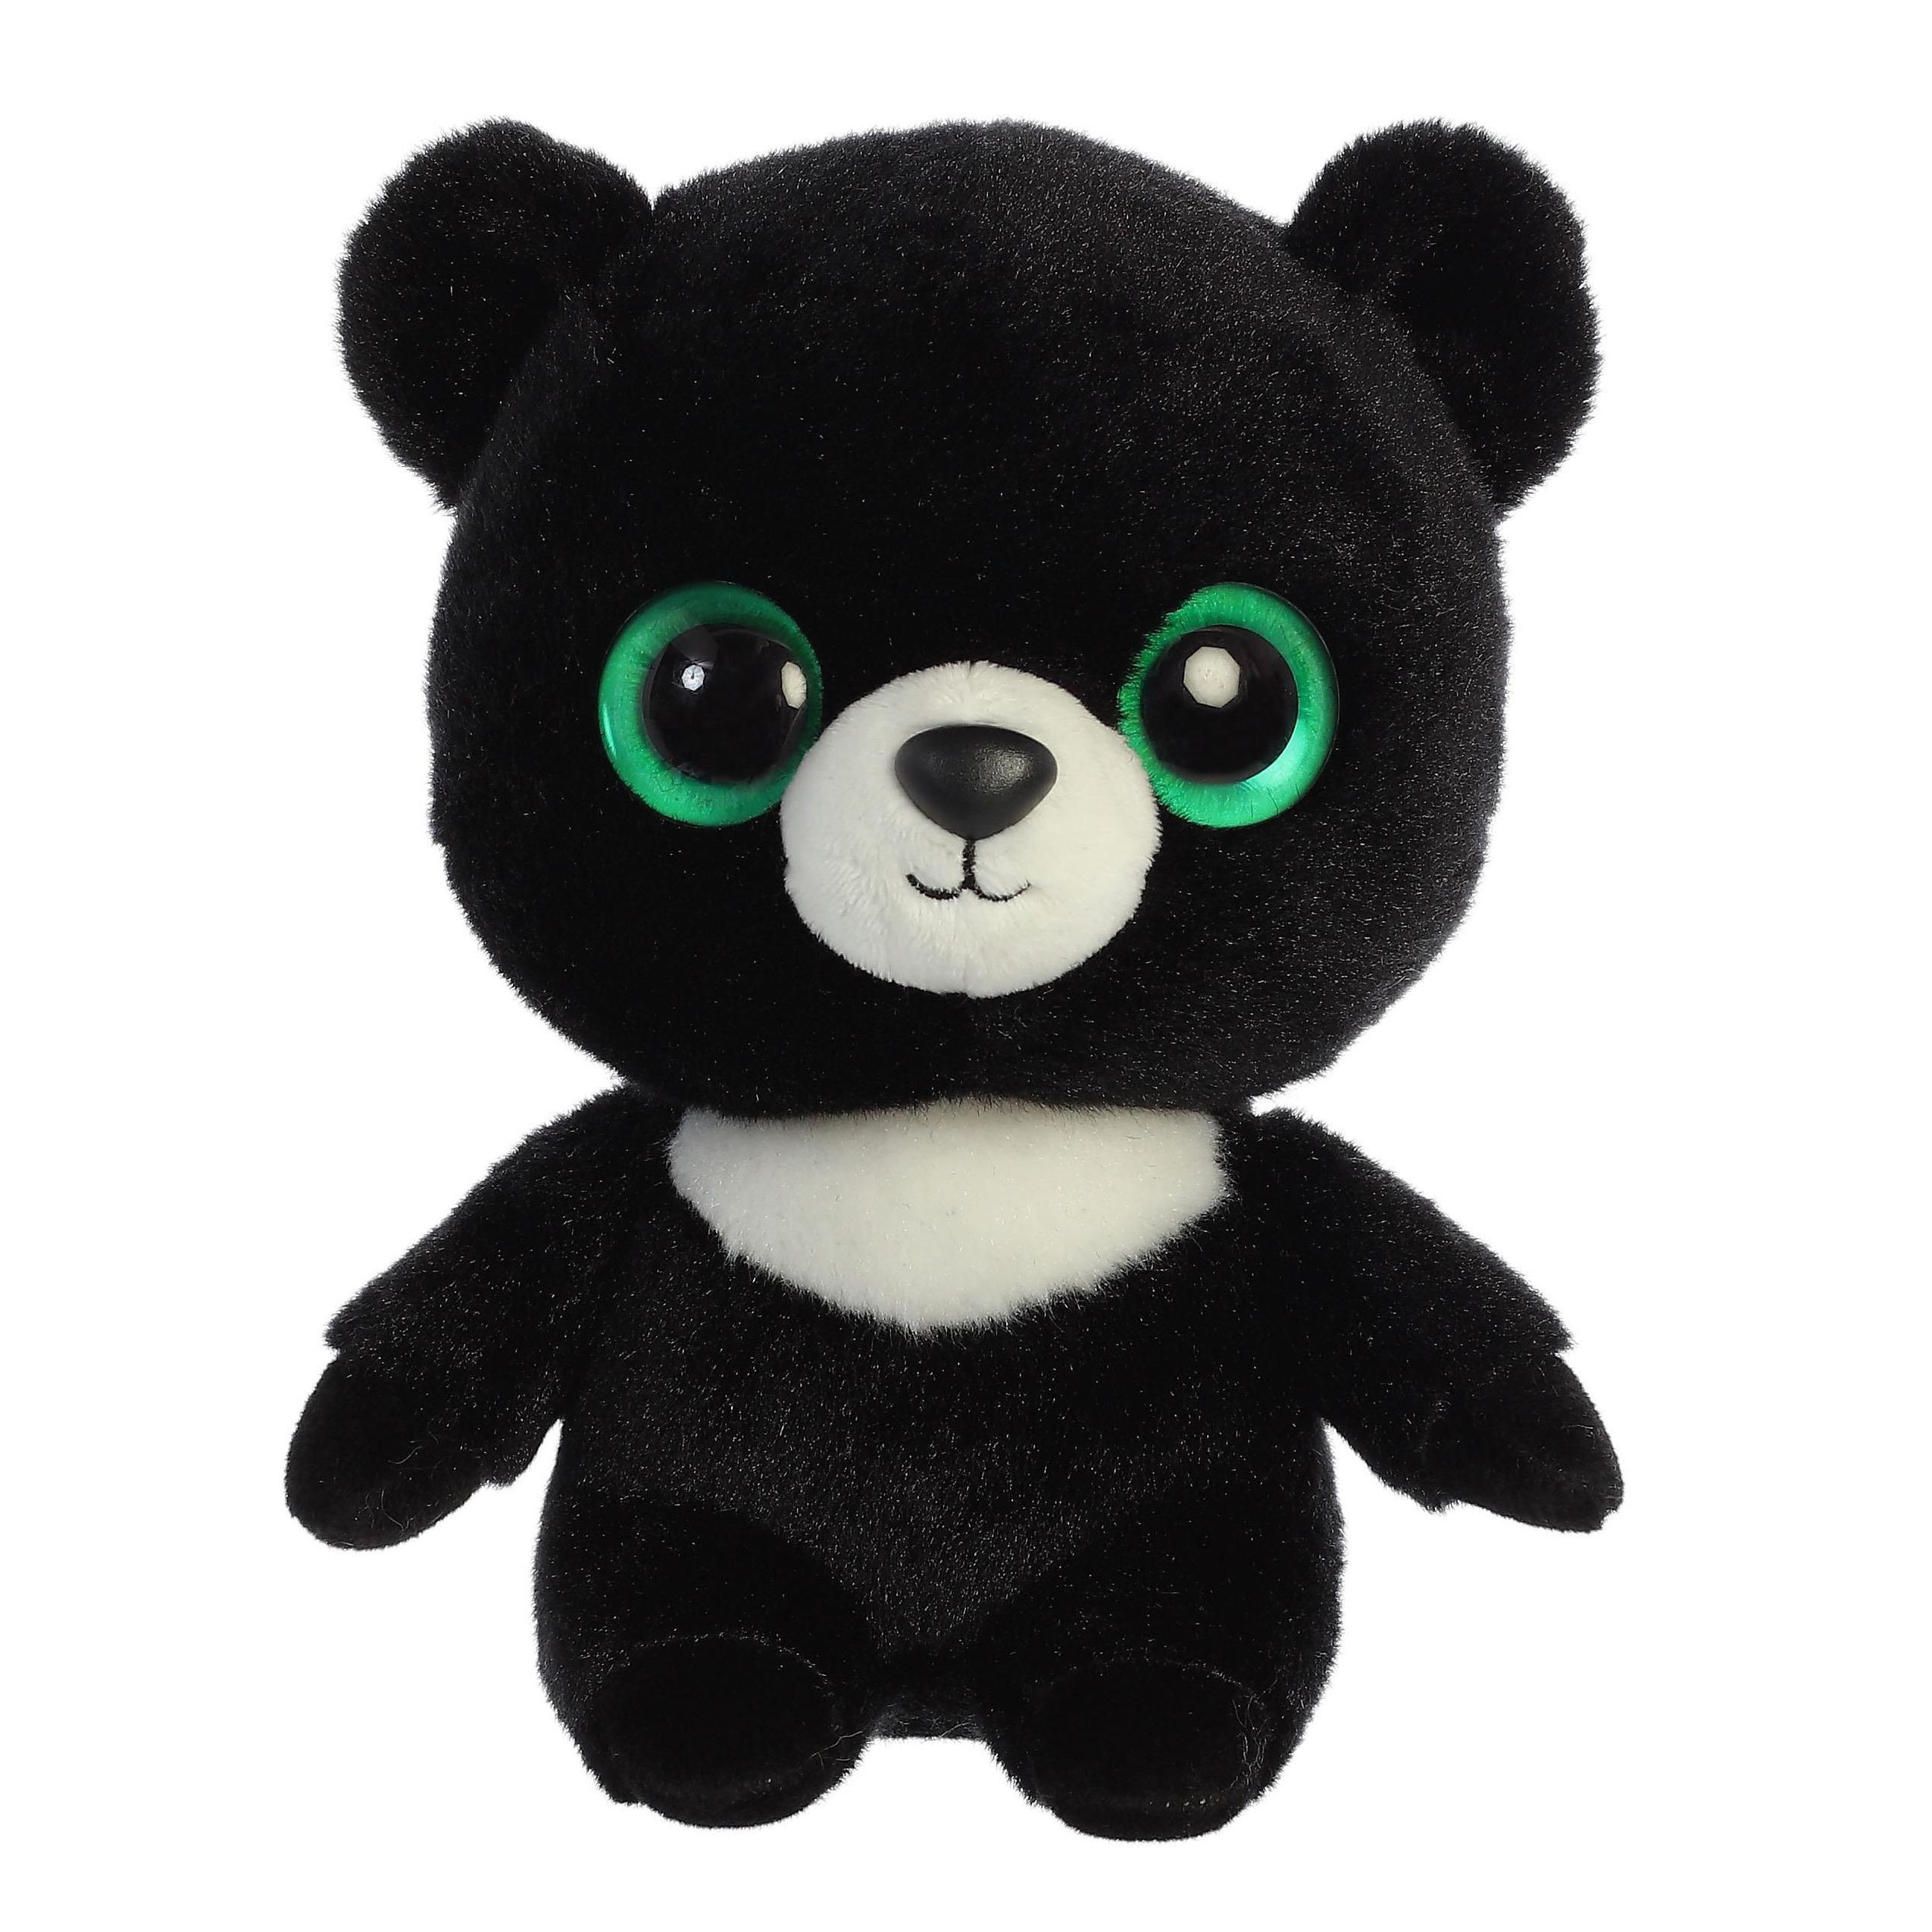 Pluche zwarte beer knuffel 20 cm